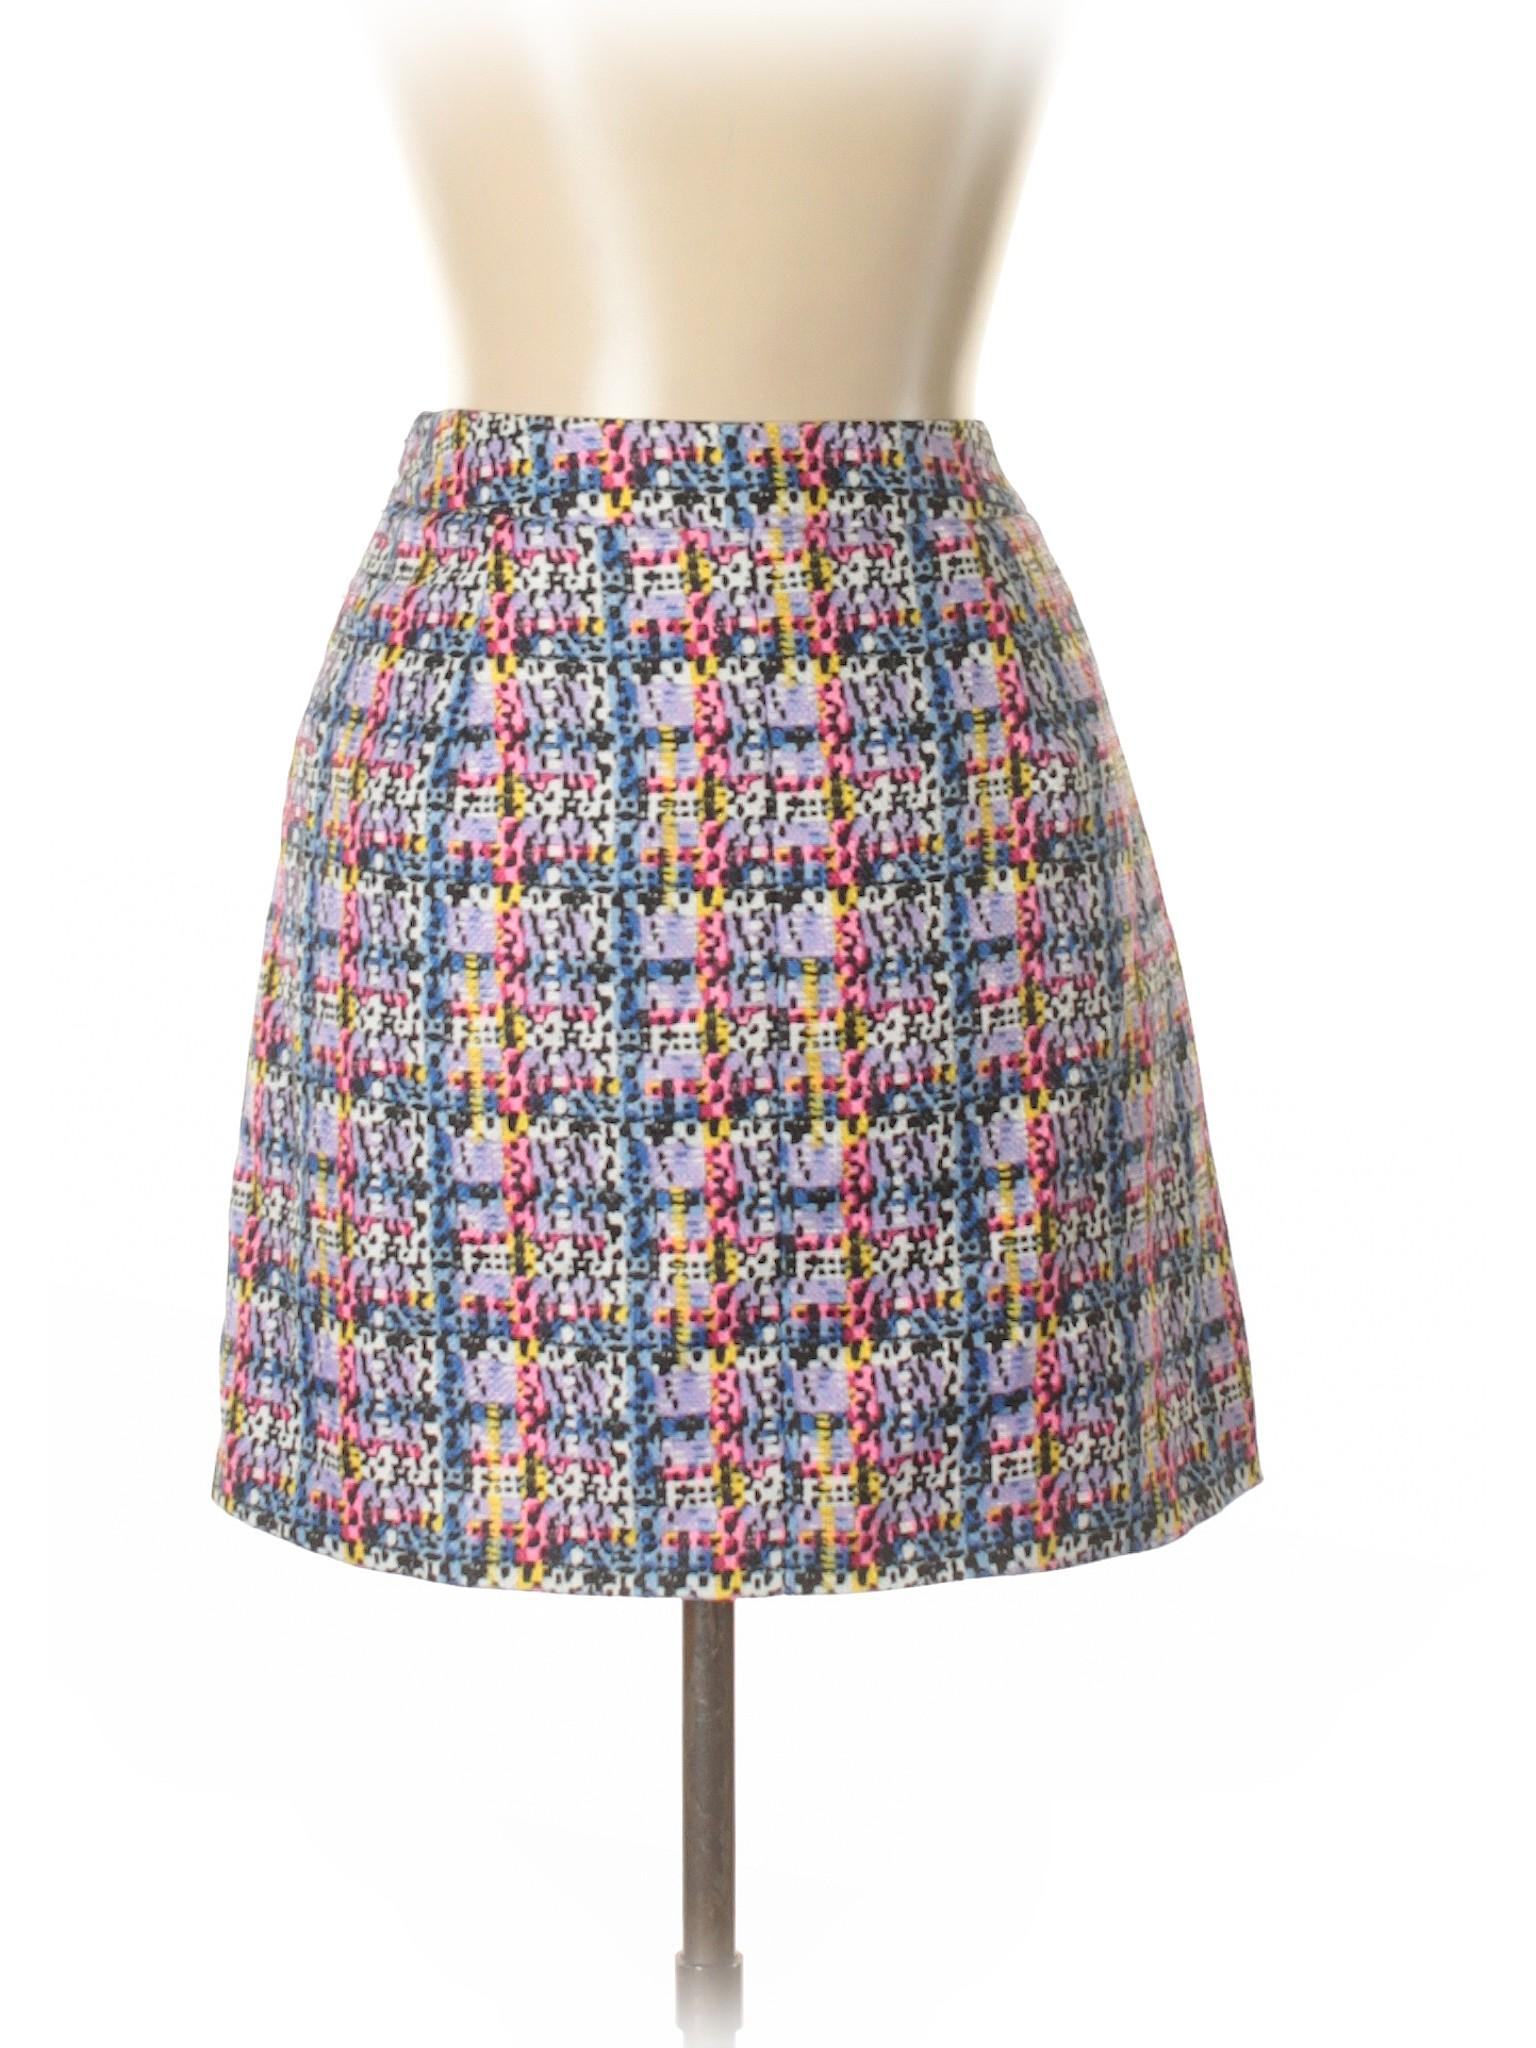 Casual Skirt Skirt Boutique Casual Boutique Casual Boutique Casual Boutique Skirt BwAqX7